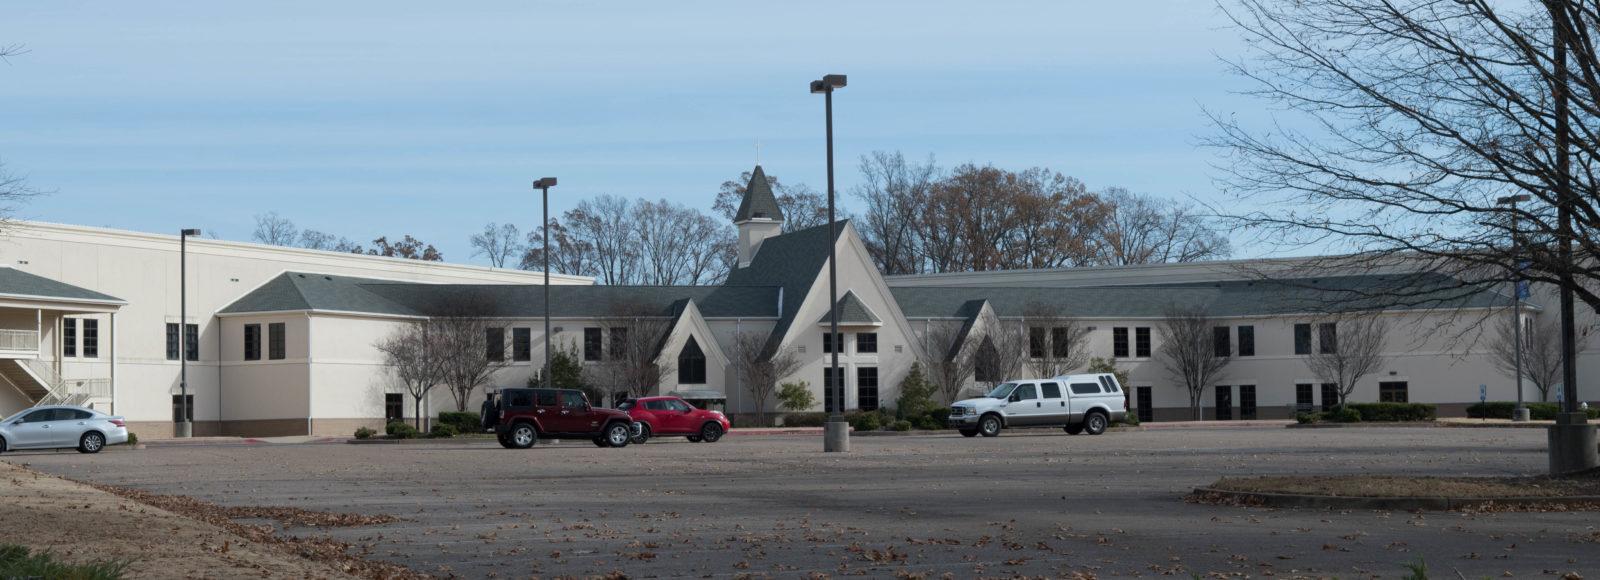 Jim West Central Church Photo